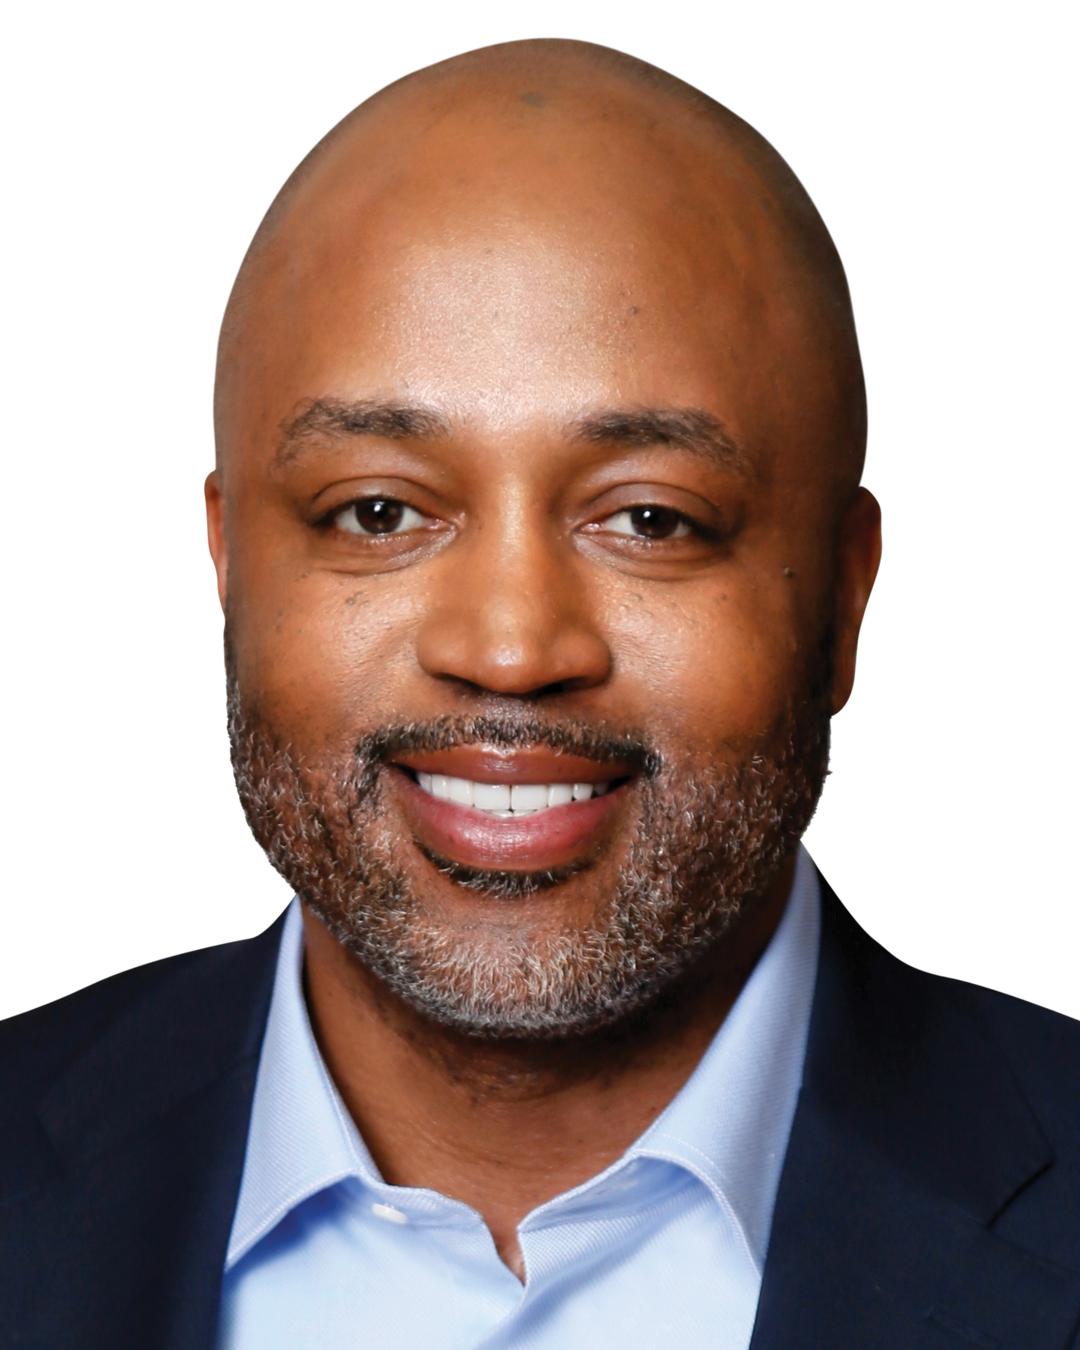 Atlanta 500: Russell Stokes